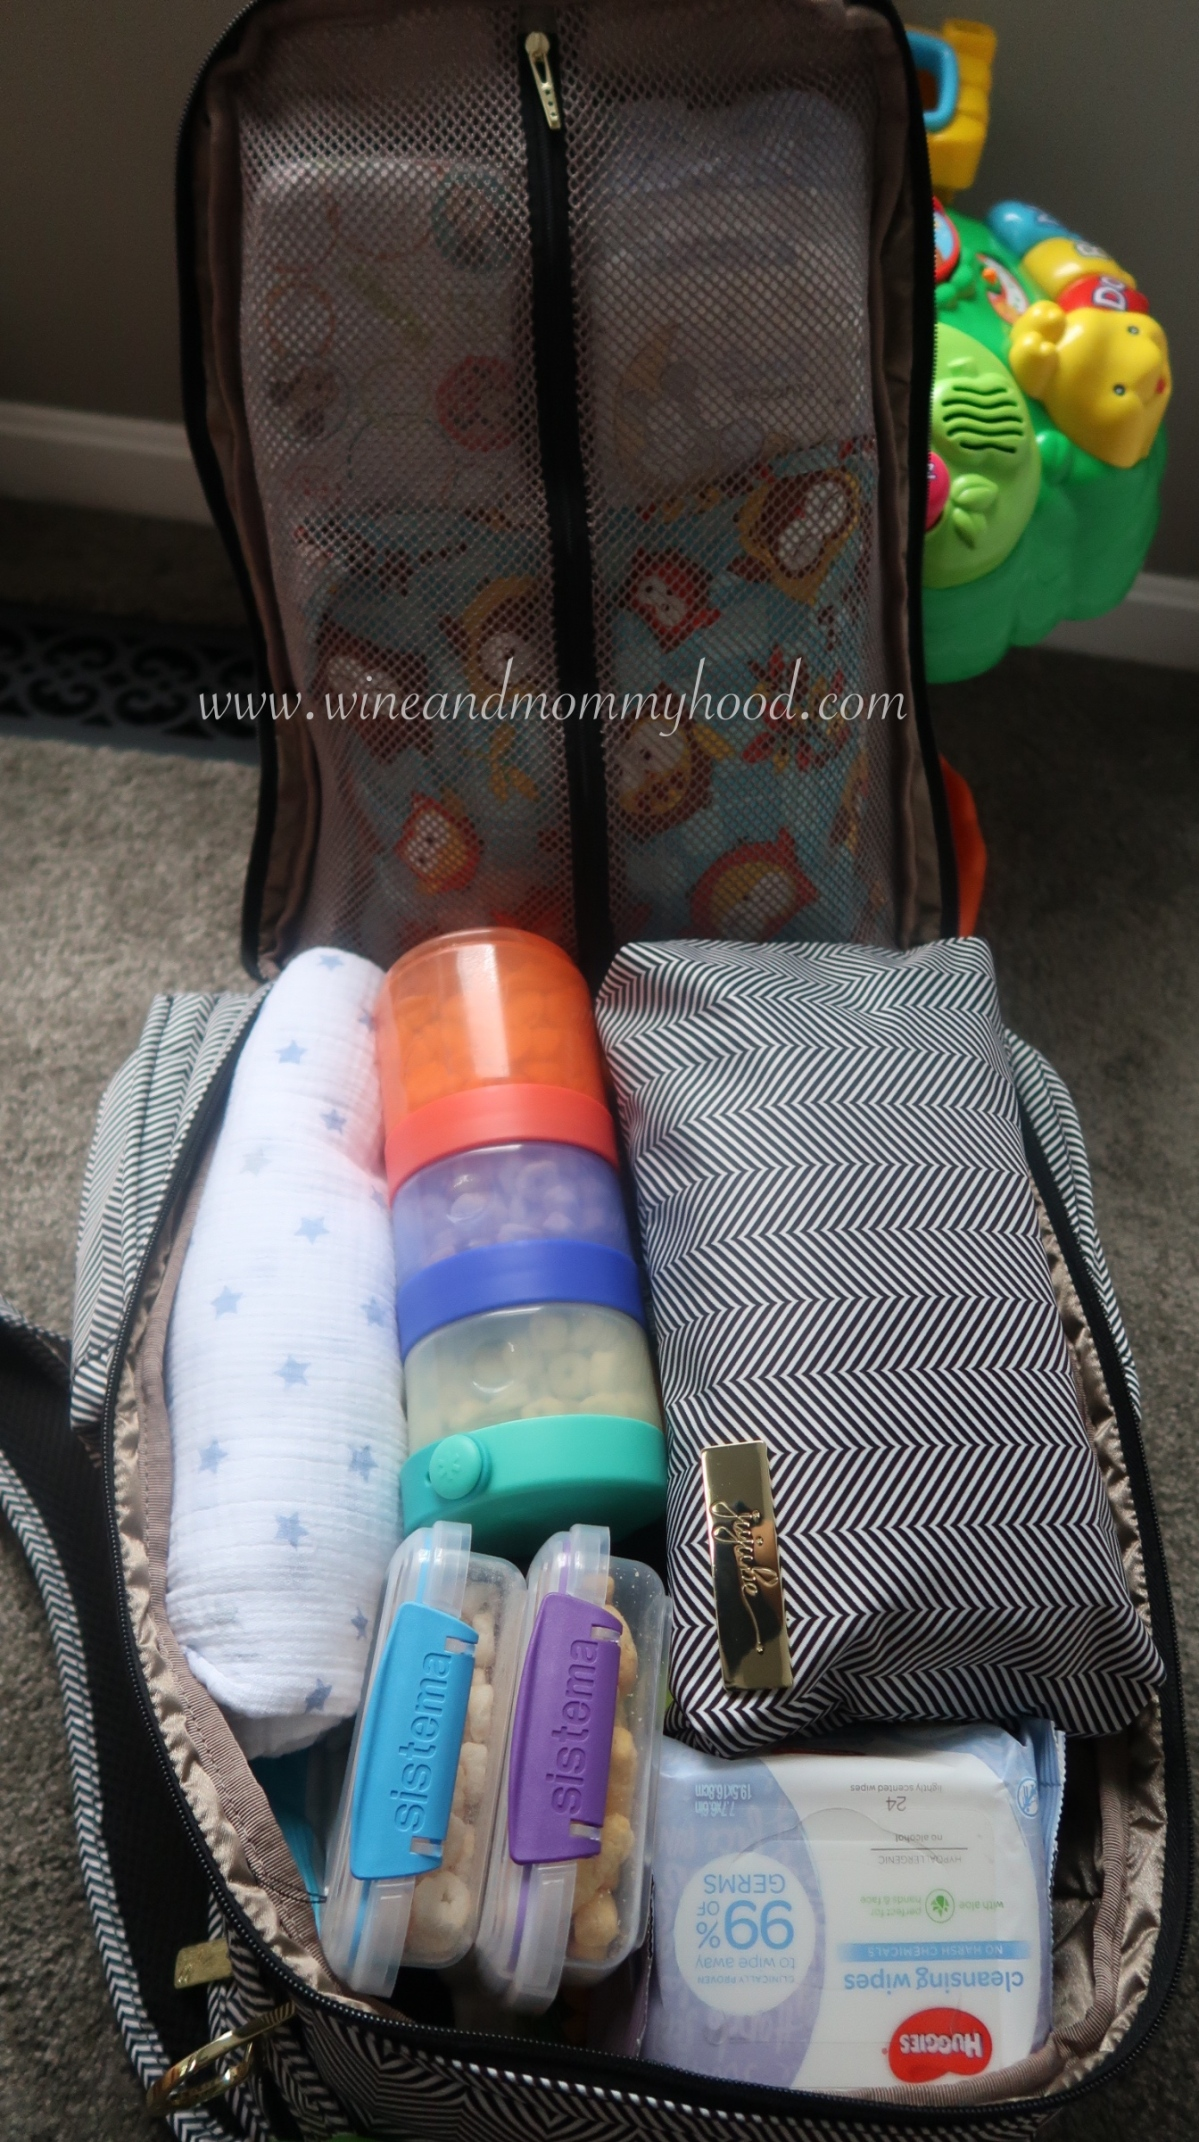 PackedUp